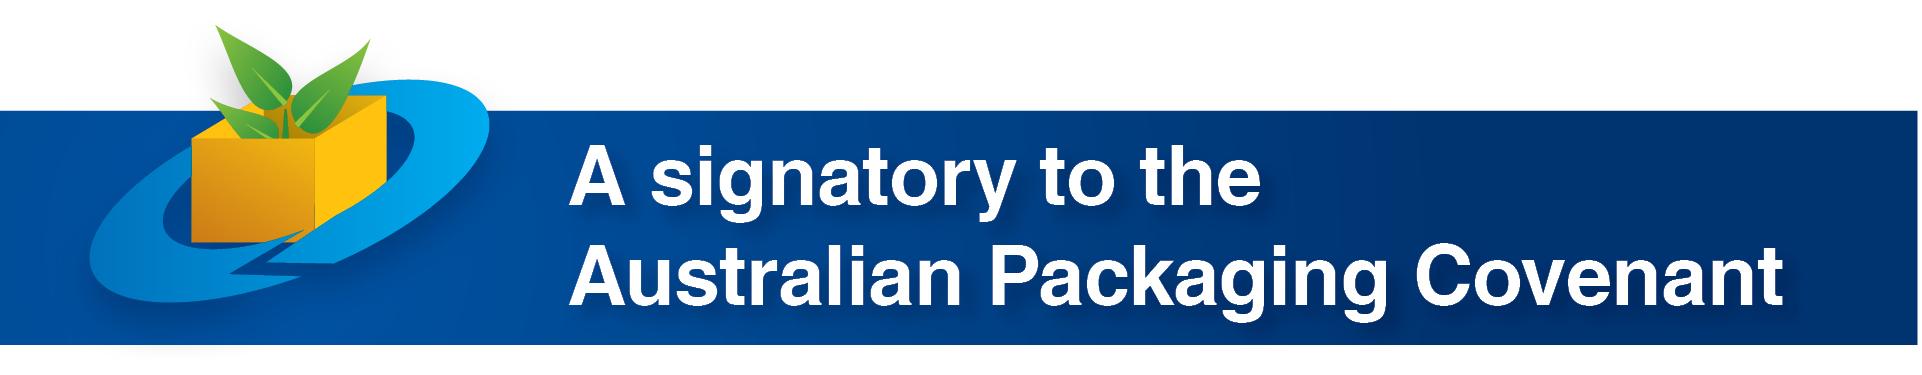 signatory-aust-packaging-covenant.jpg